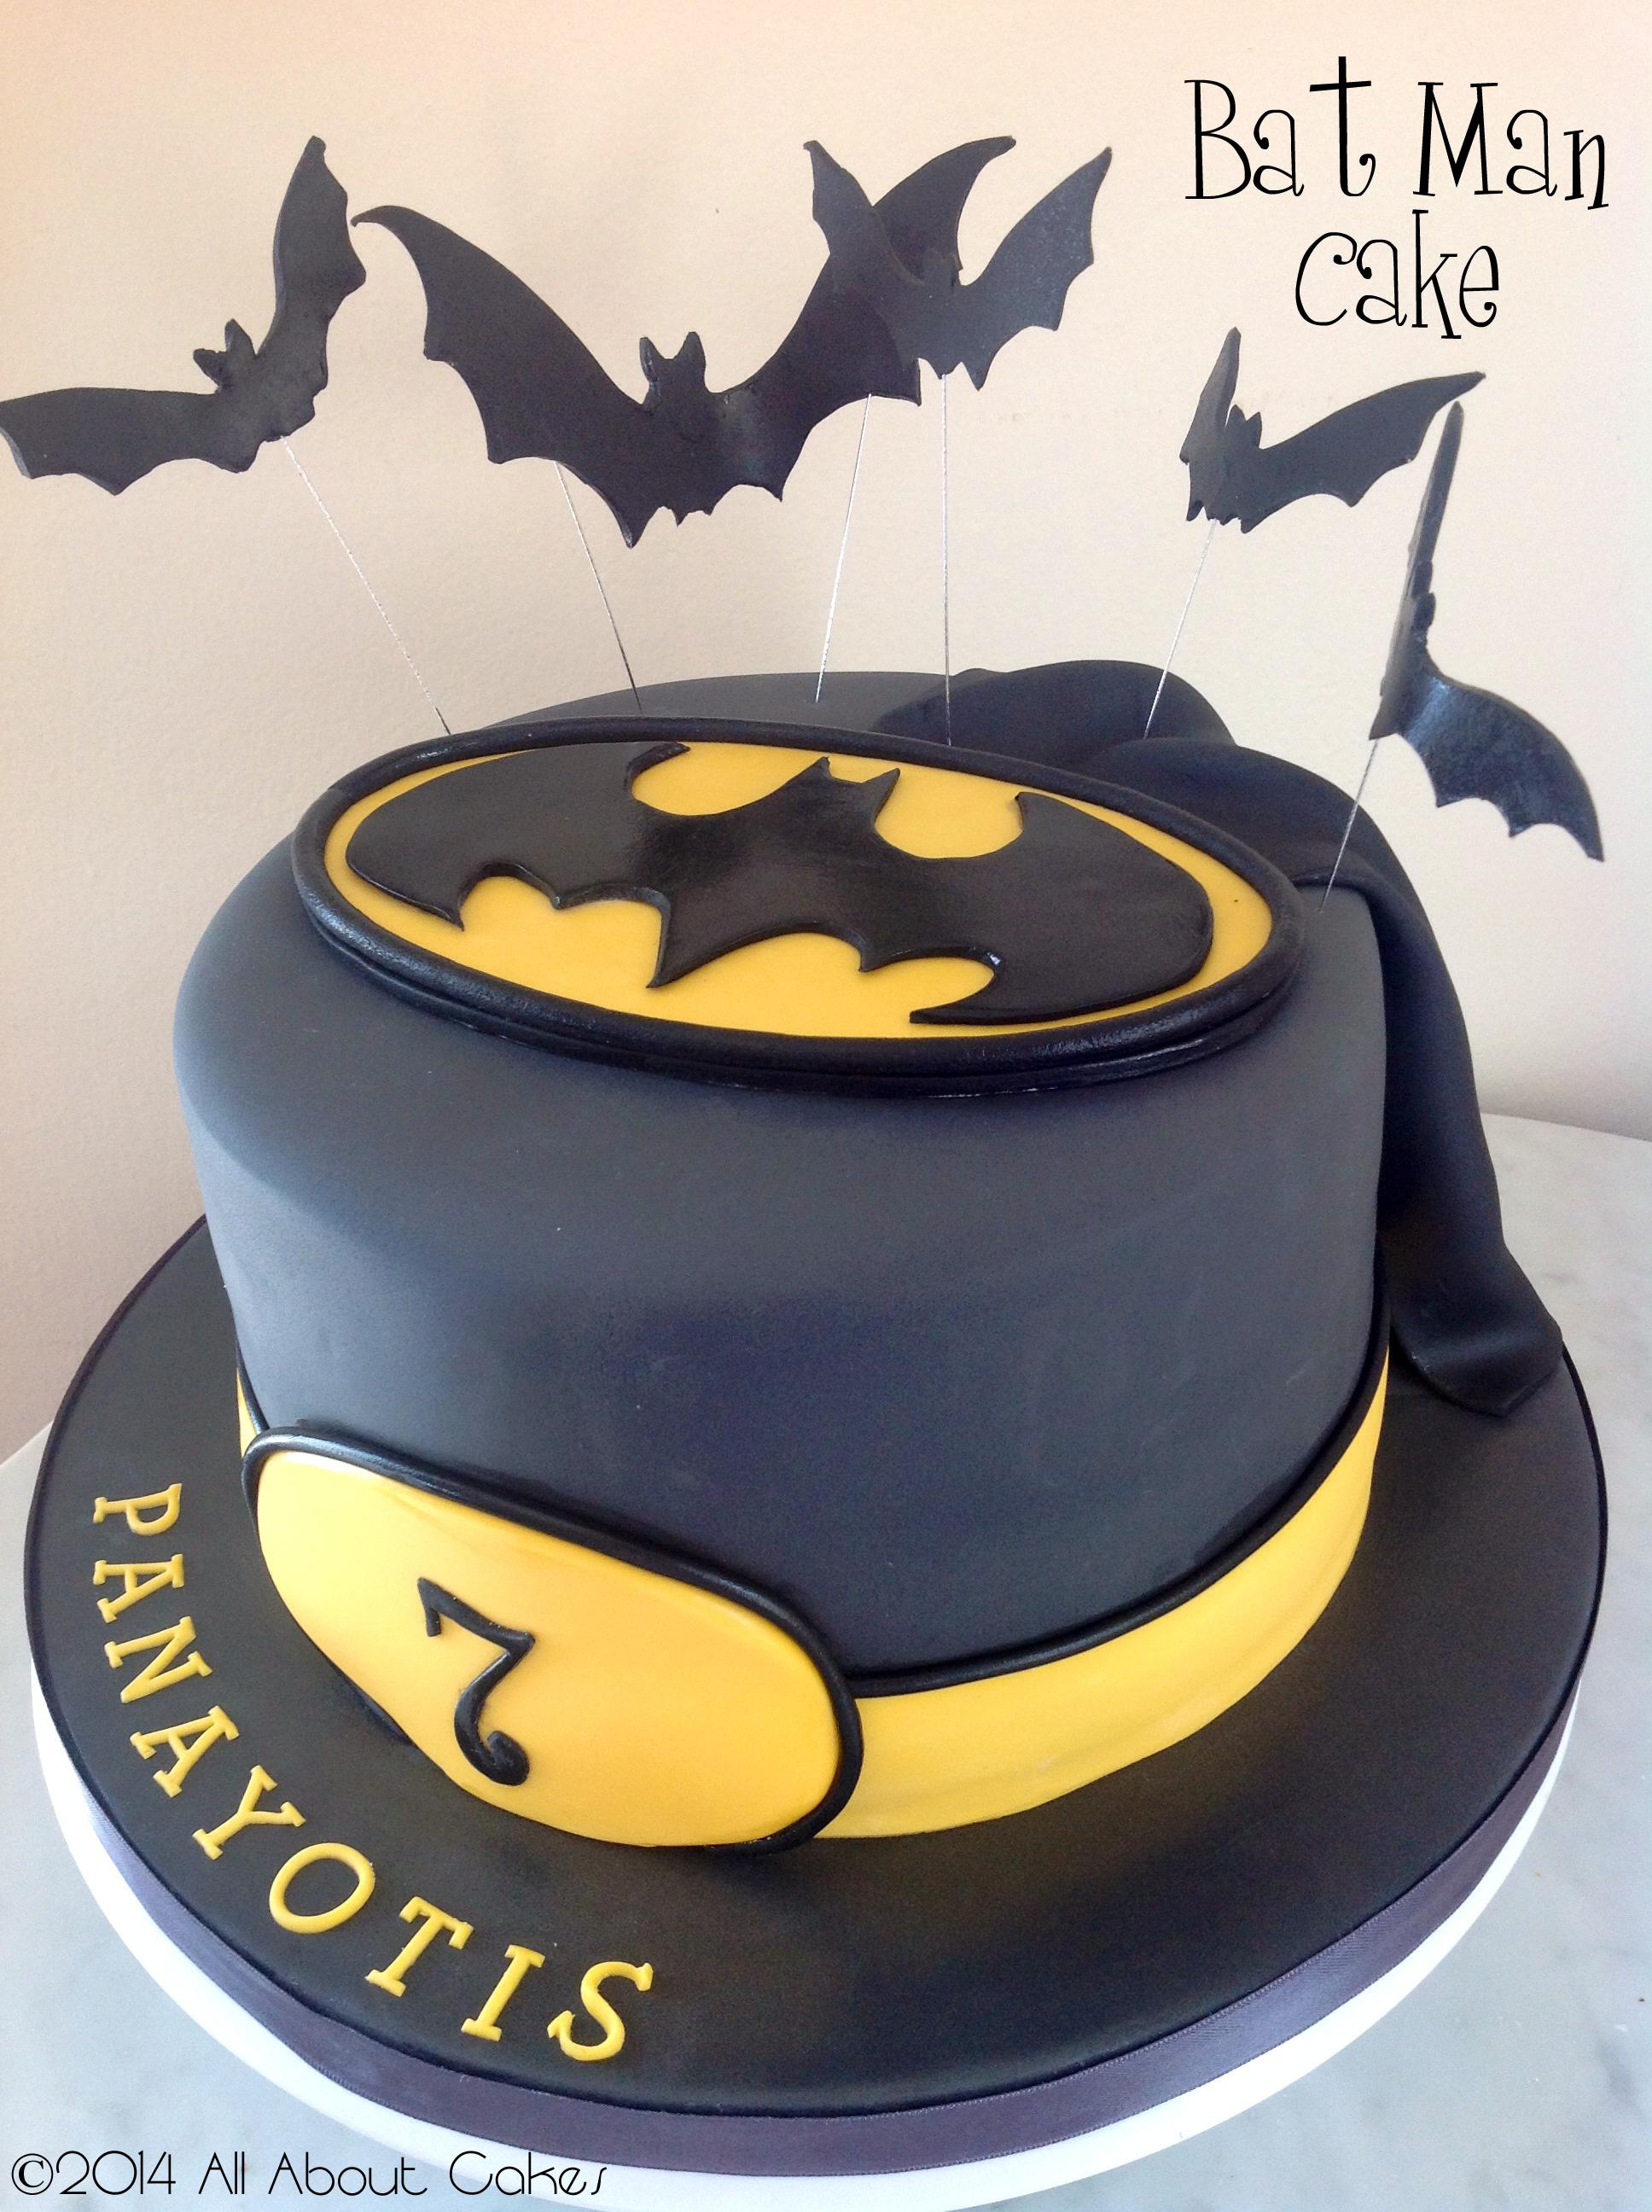 Bat Man Cake | batman | Pinterest | Batman kuchen, Motivtorten und ...